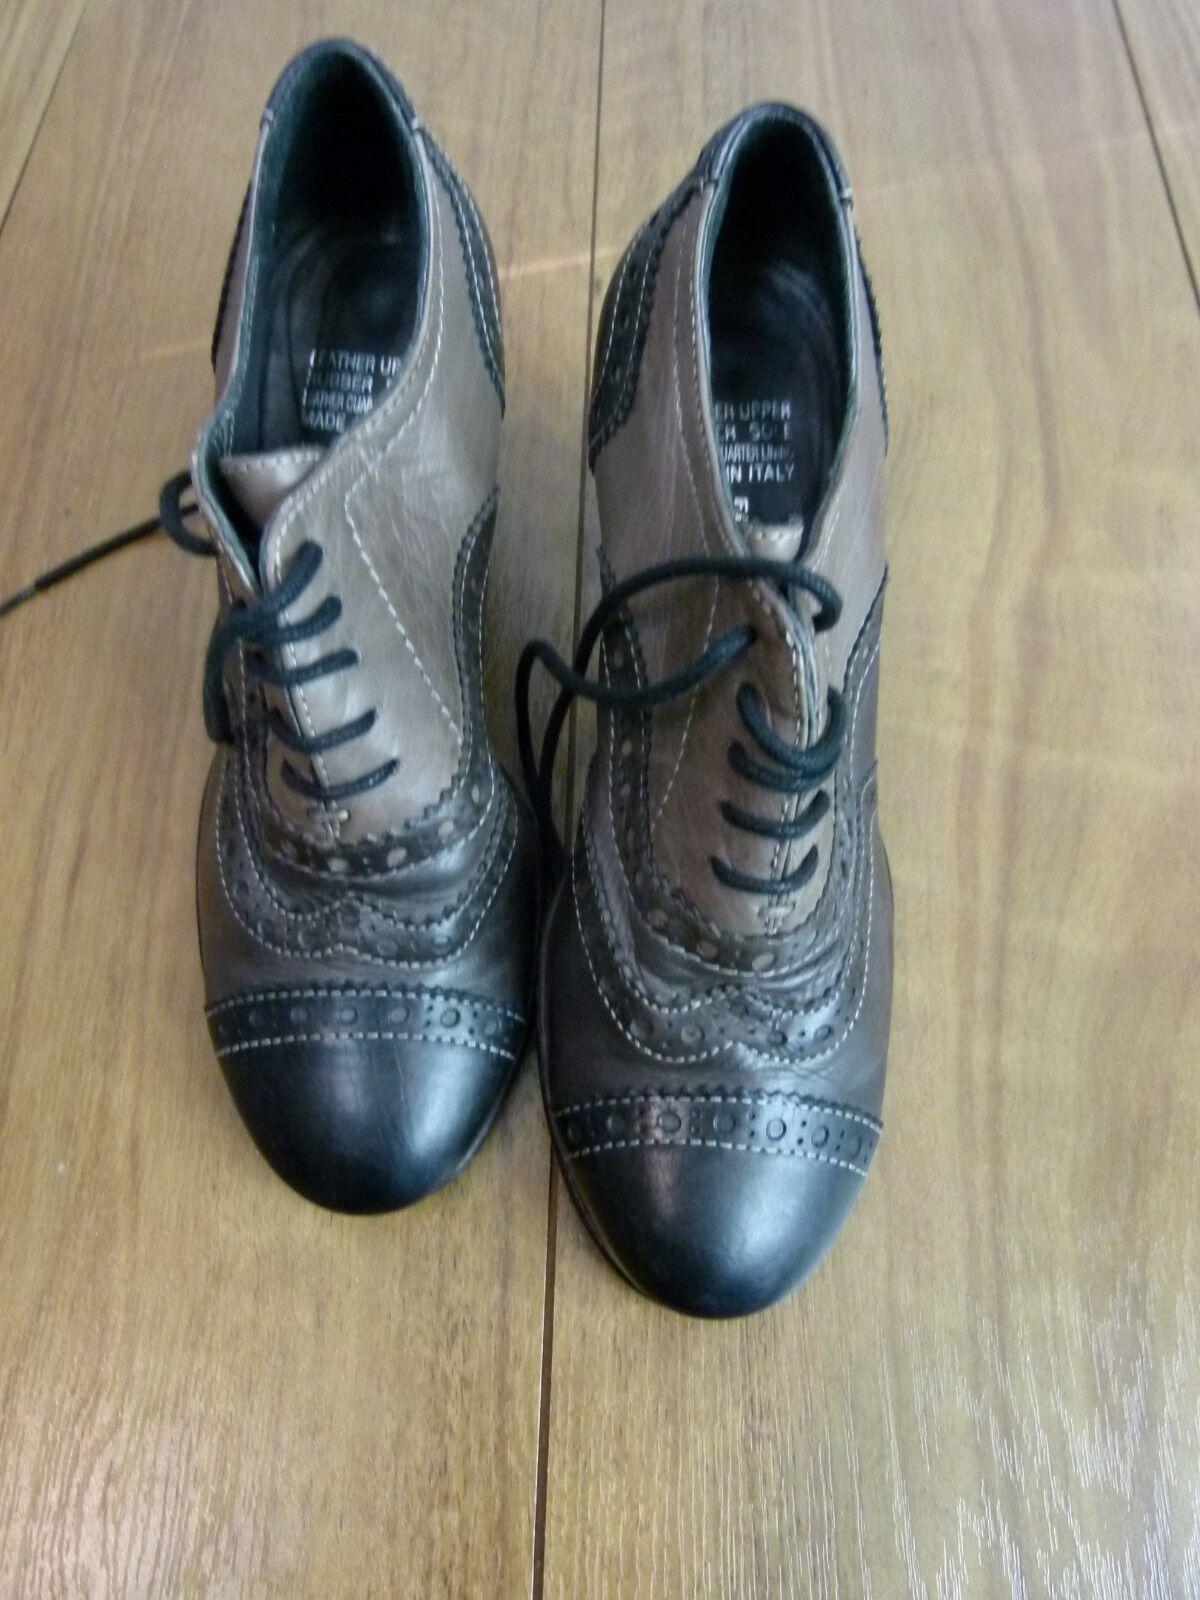 FILIPPO RAPHAEL Heels ankle bottes Sz 35 marron, noir Leather